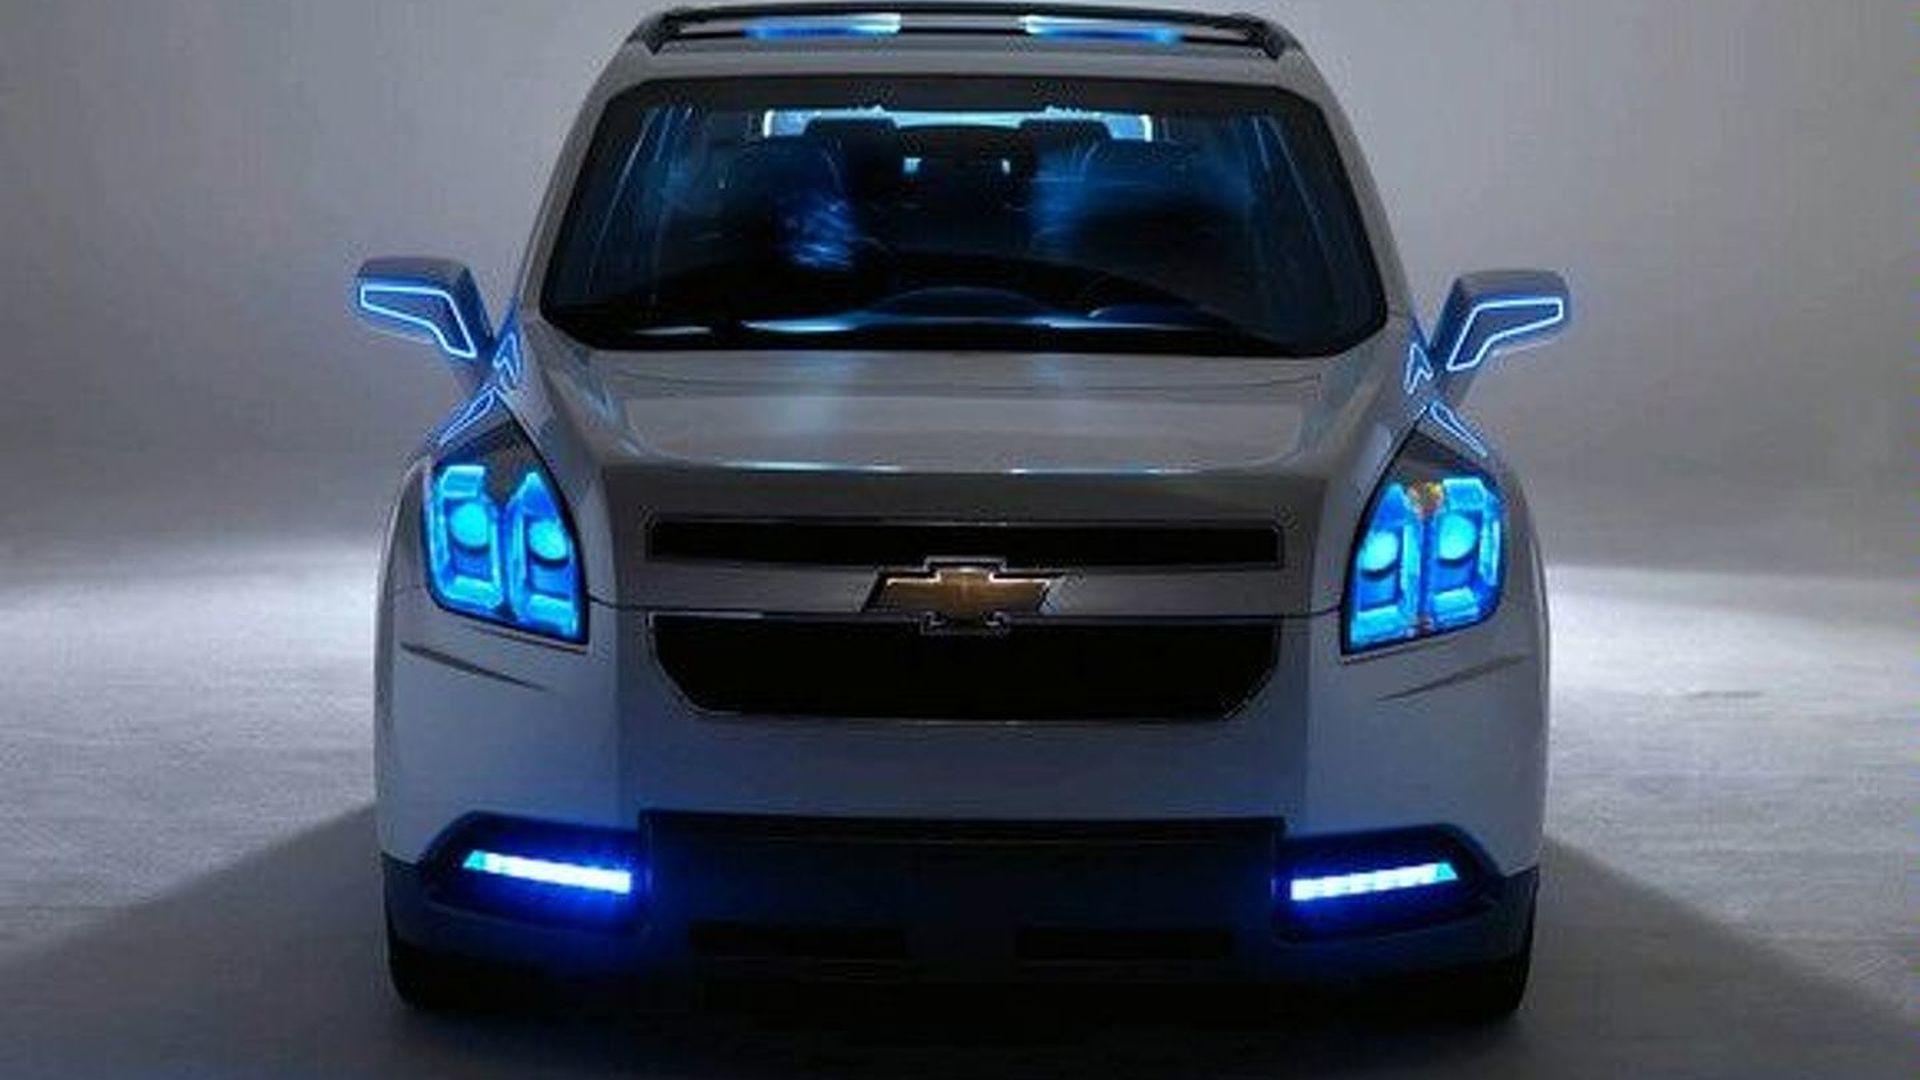 Kelebihan Kekurangan Chevrolet Orlando Review